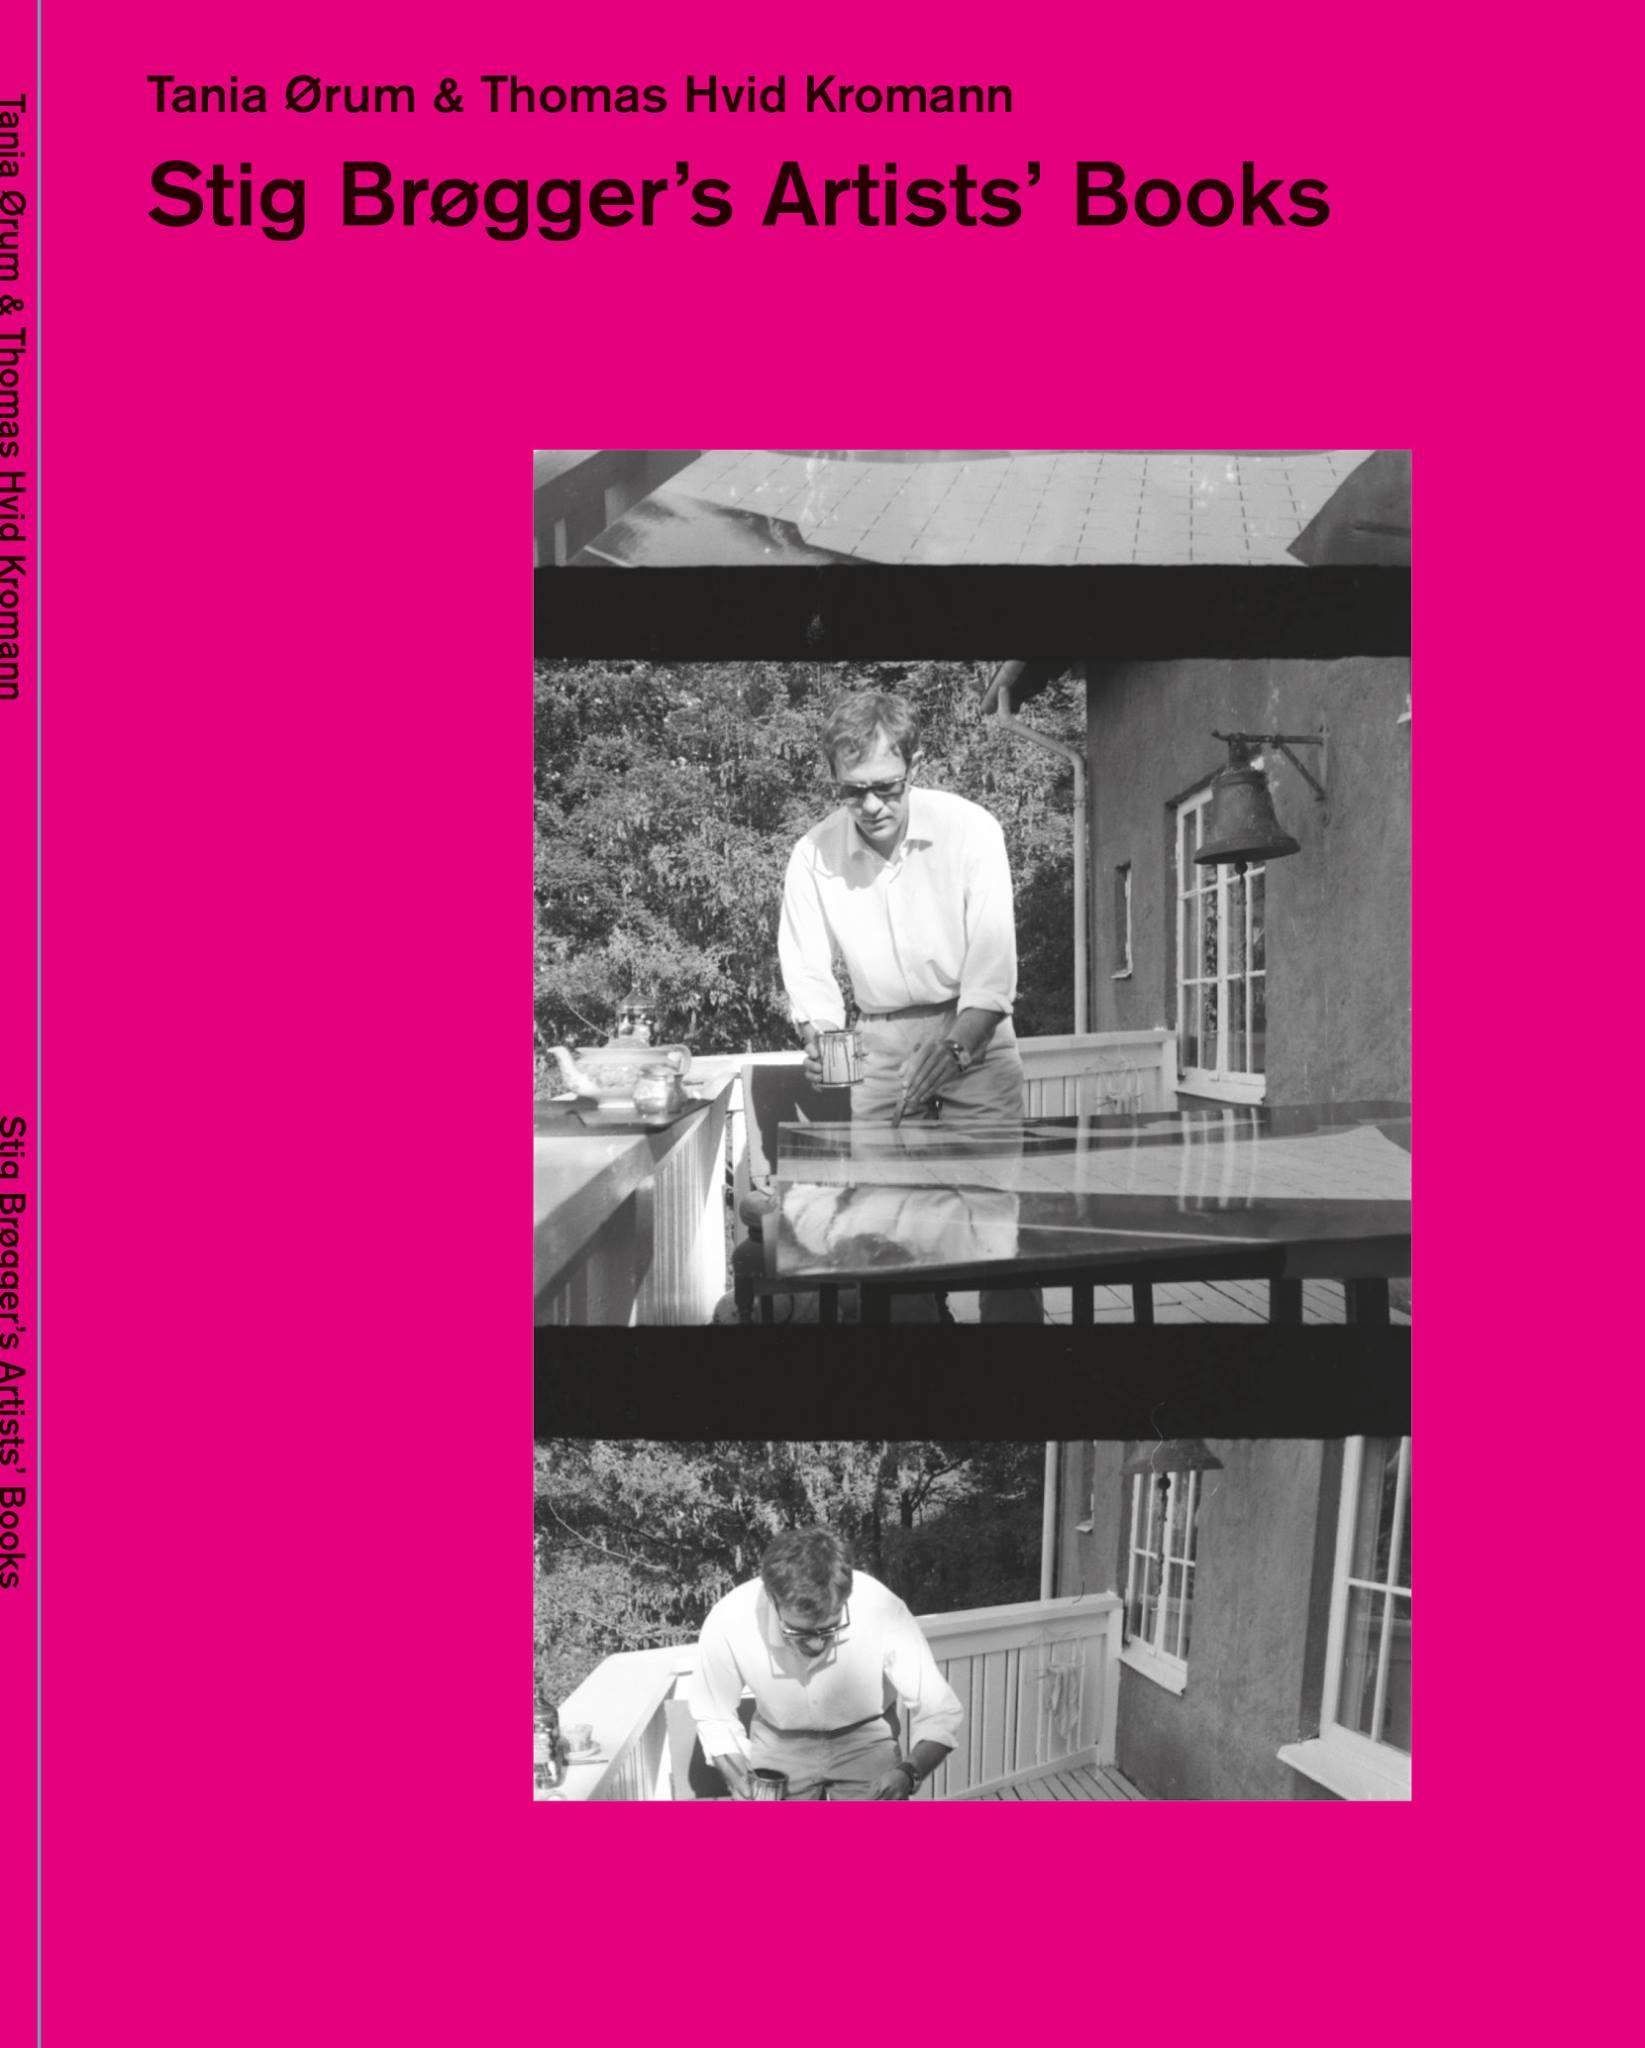 stig-broegger-artists-books.jpg